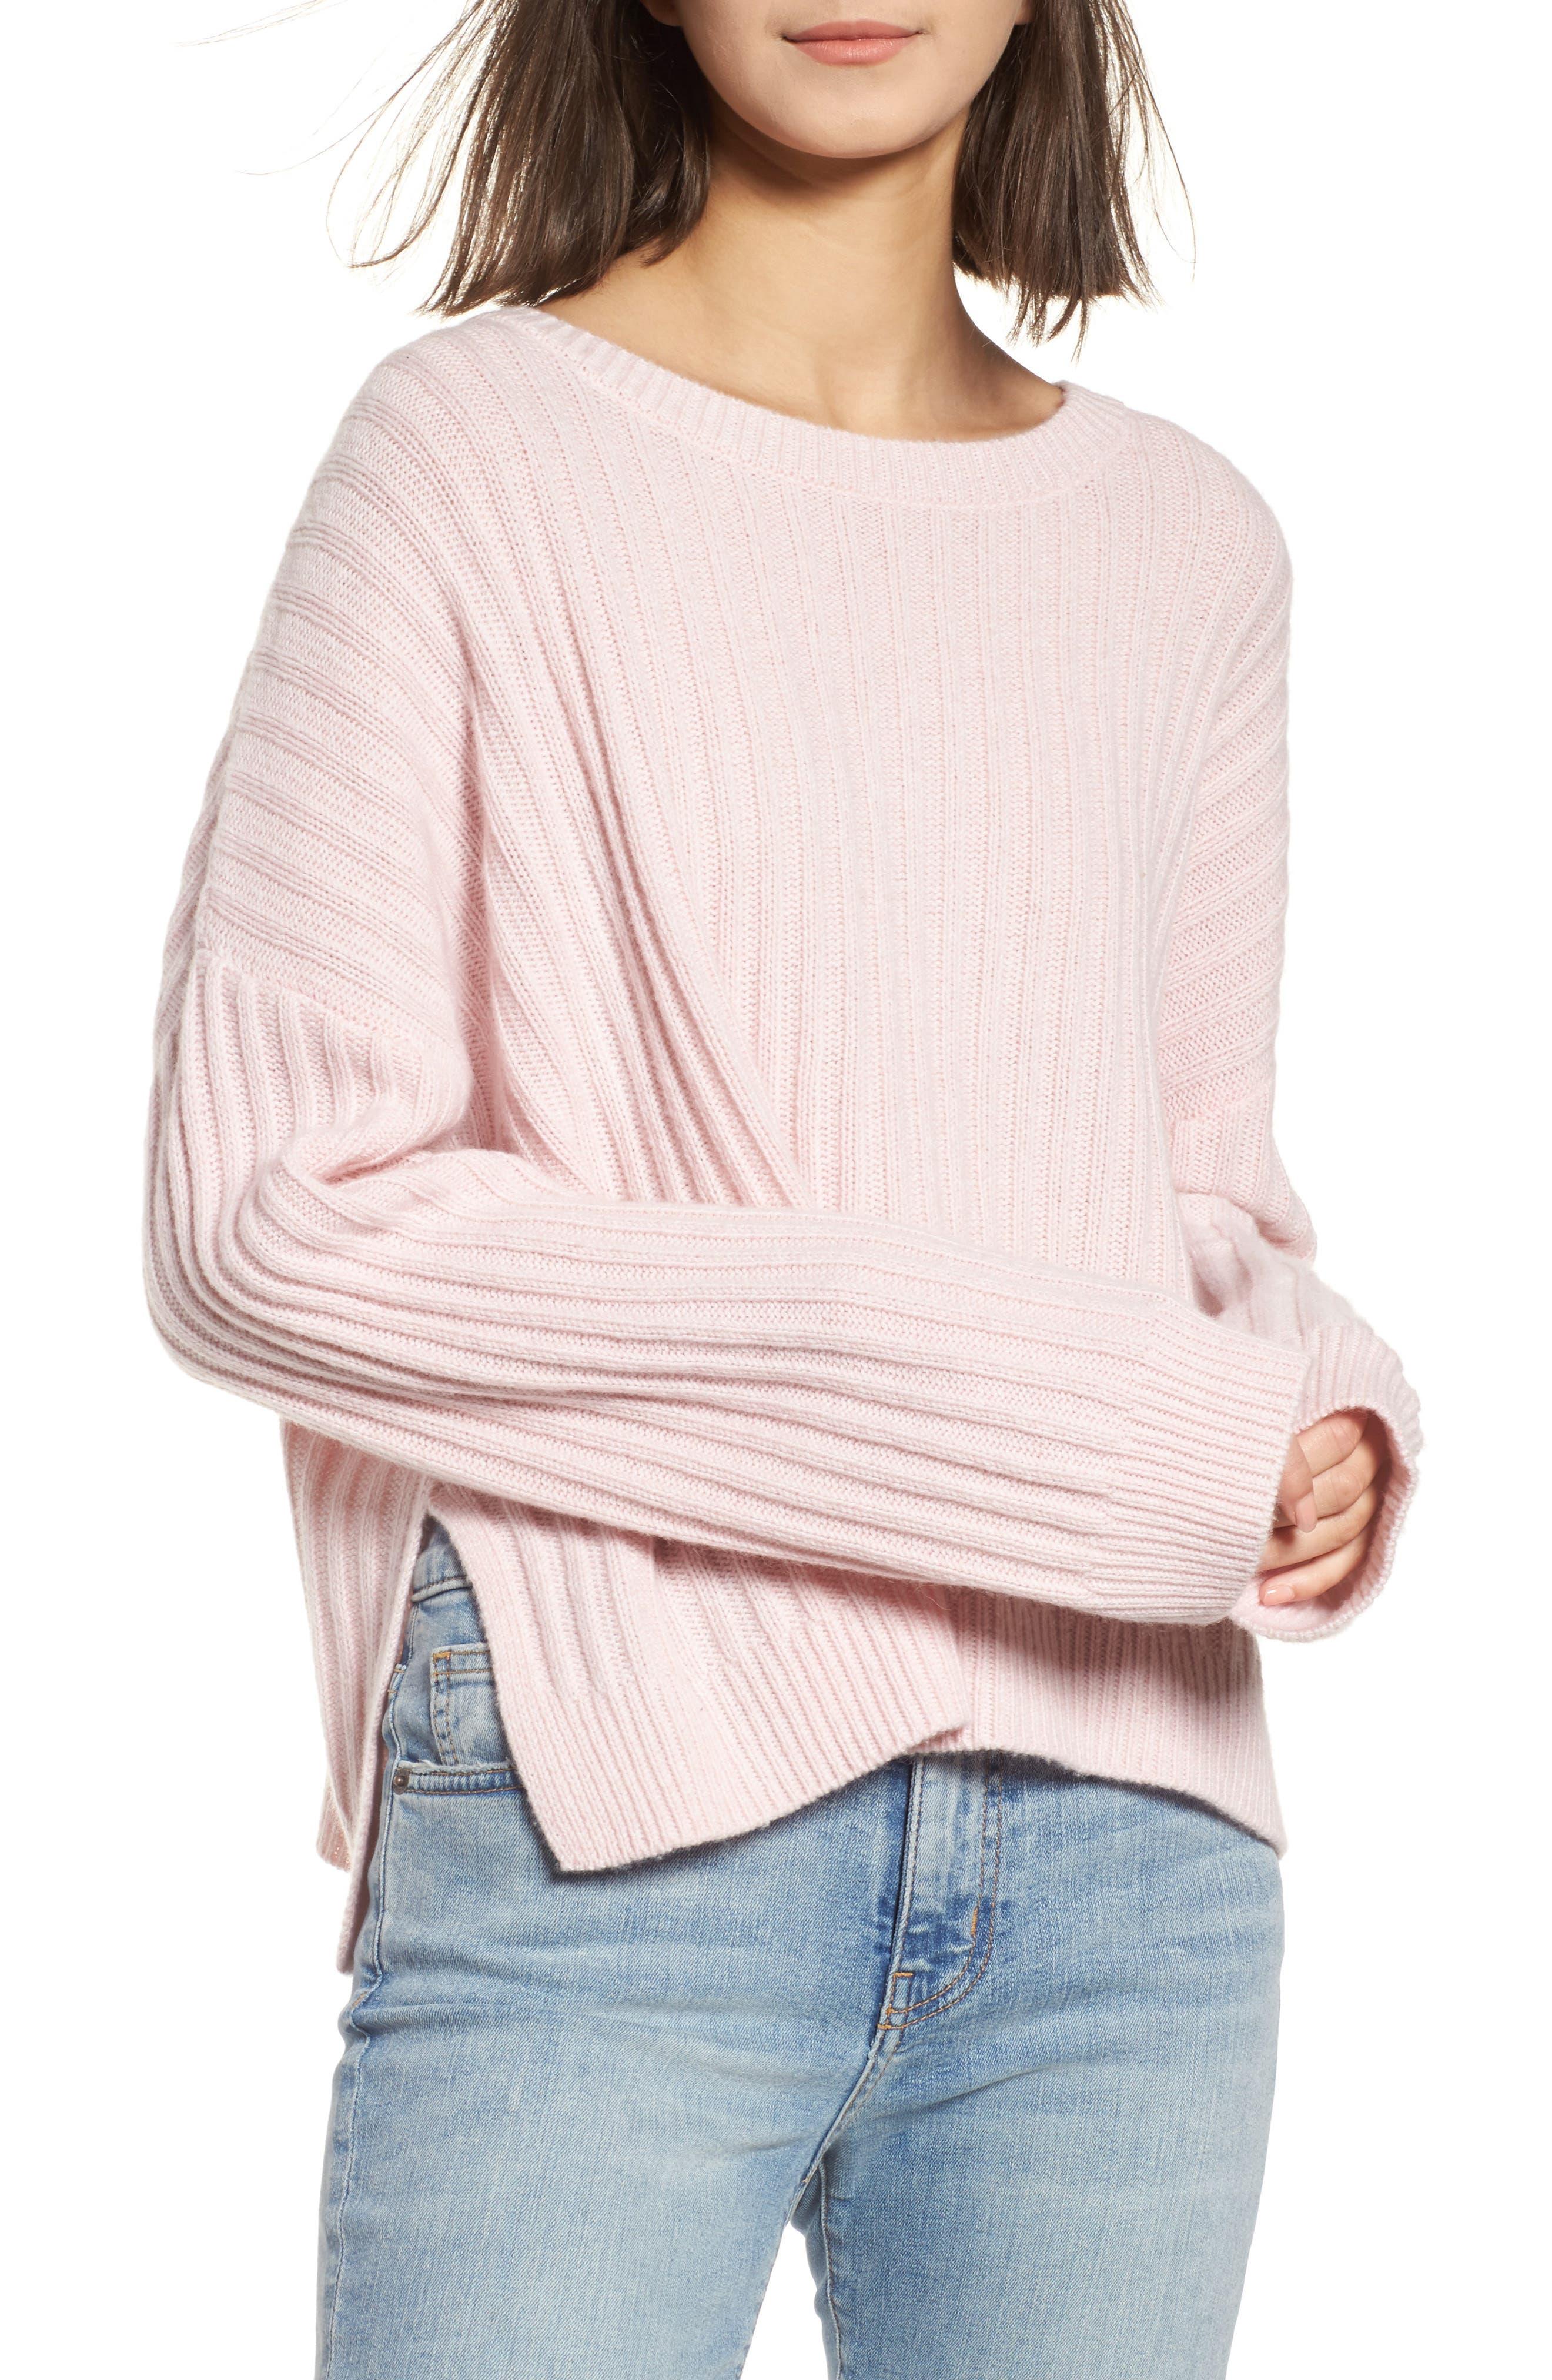 Main Image - Rails Joelle Rib Wool & Cashmere Sweater